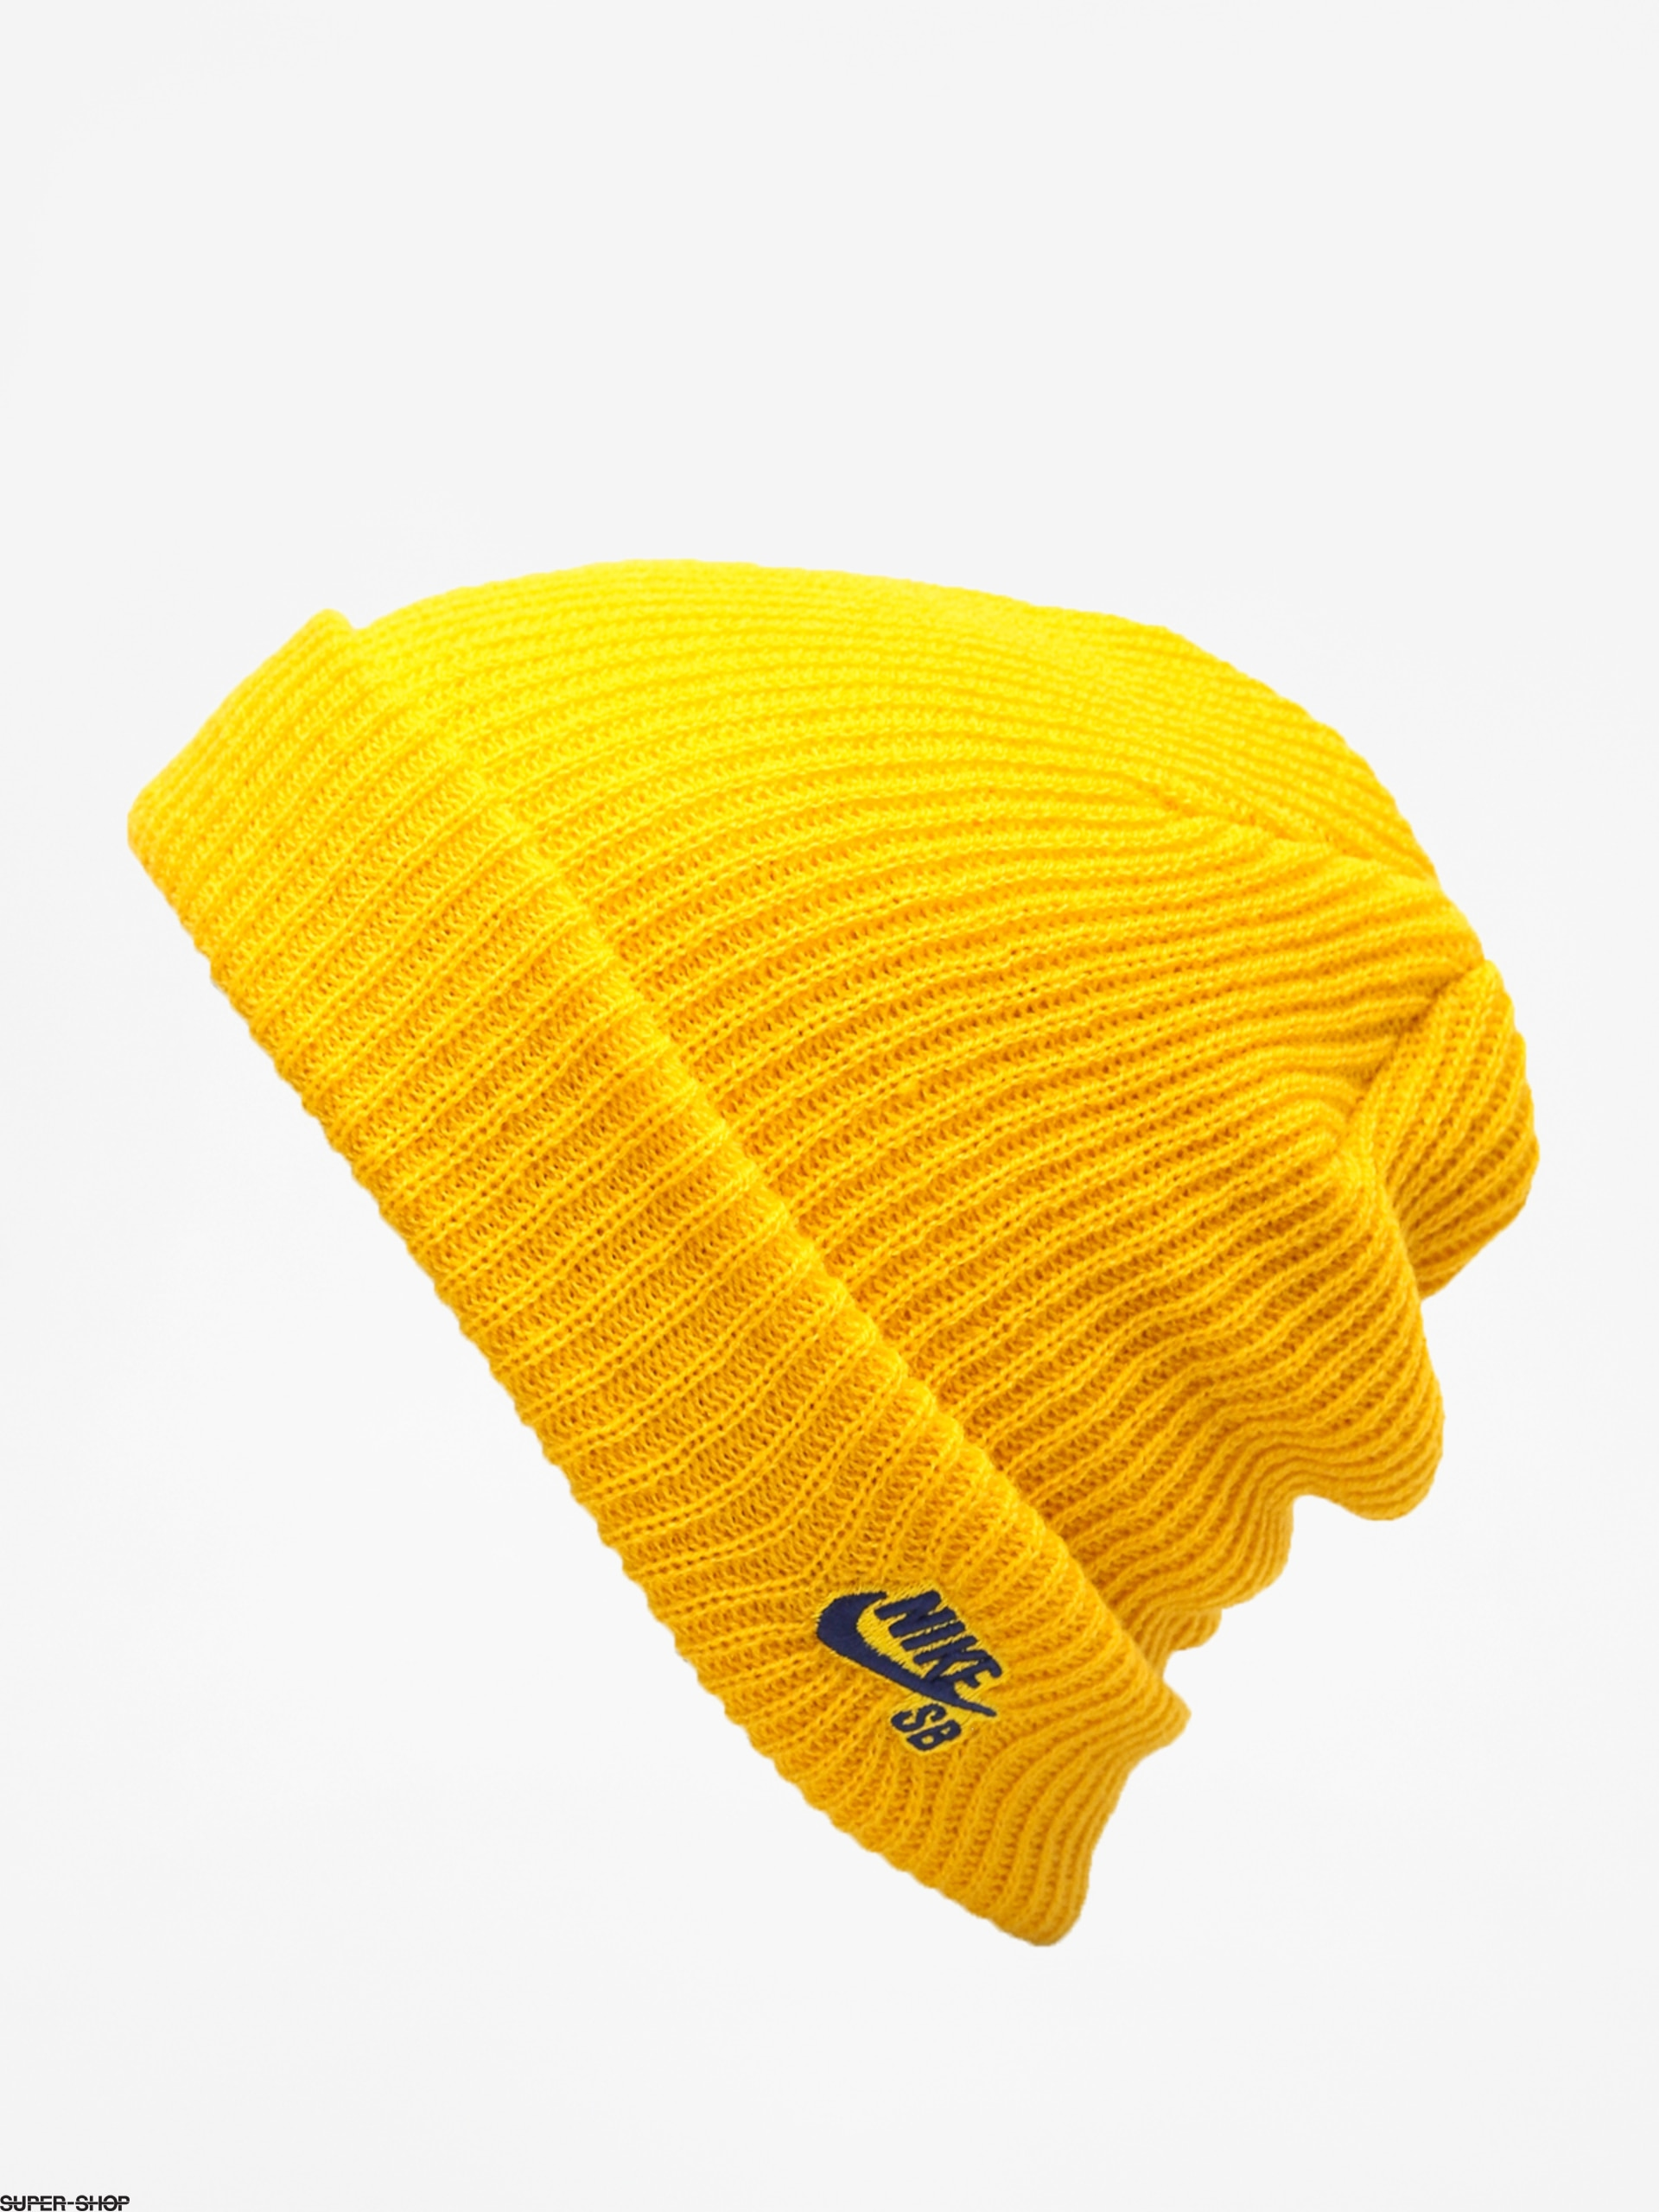 7cf440ffb0c2c8 Nike SB Sb Fisherman Beanie (yellow ochre/blue void)